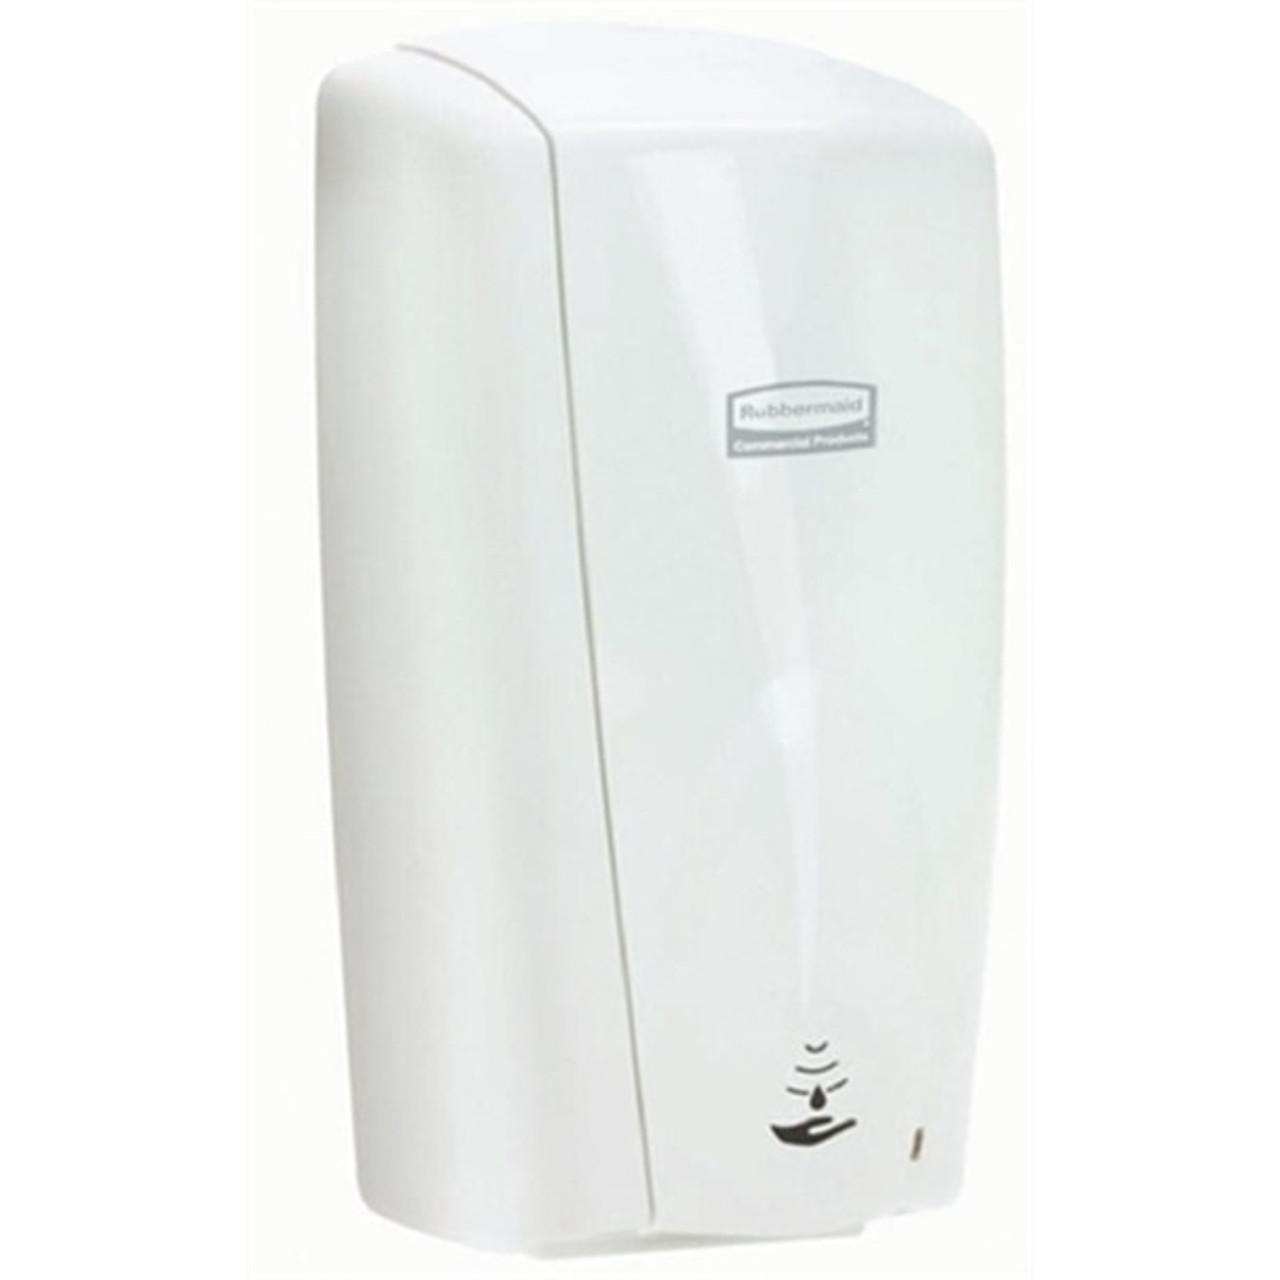 Rubbermaid White Autofoam Dispenser with Alcohol Plus Hand Rub Bundle